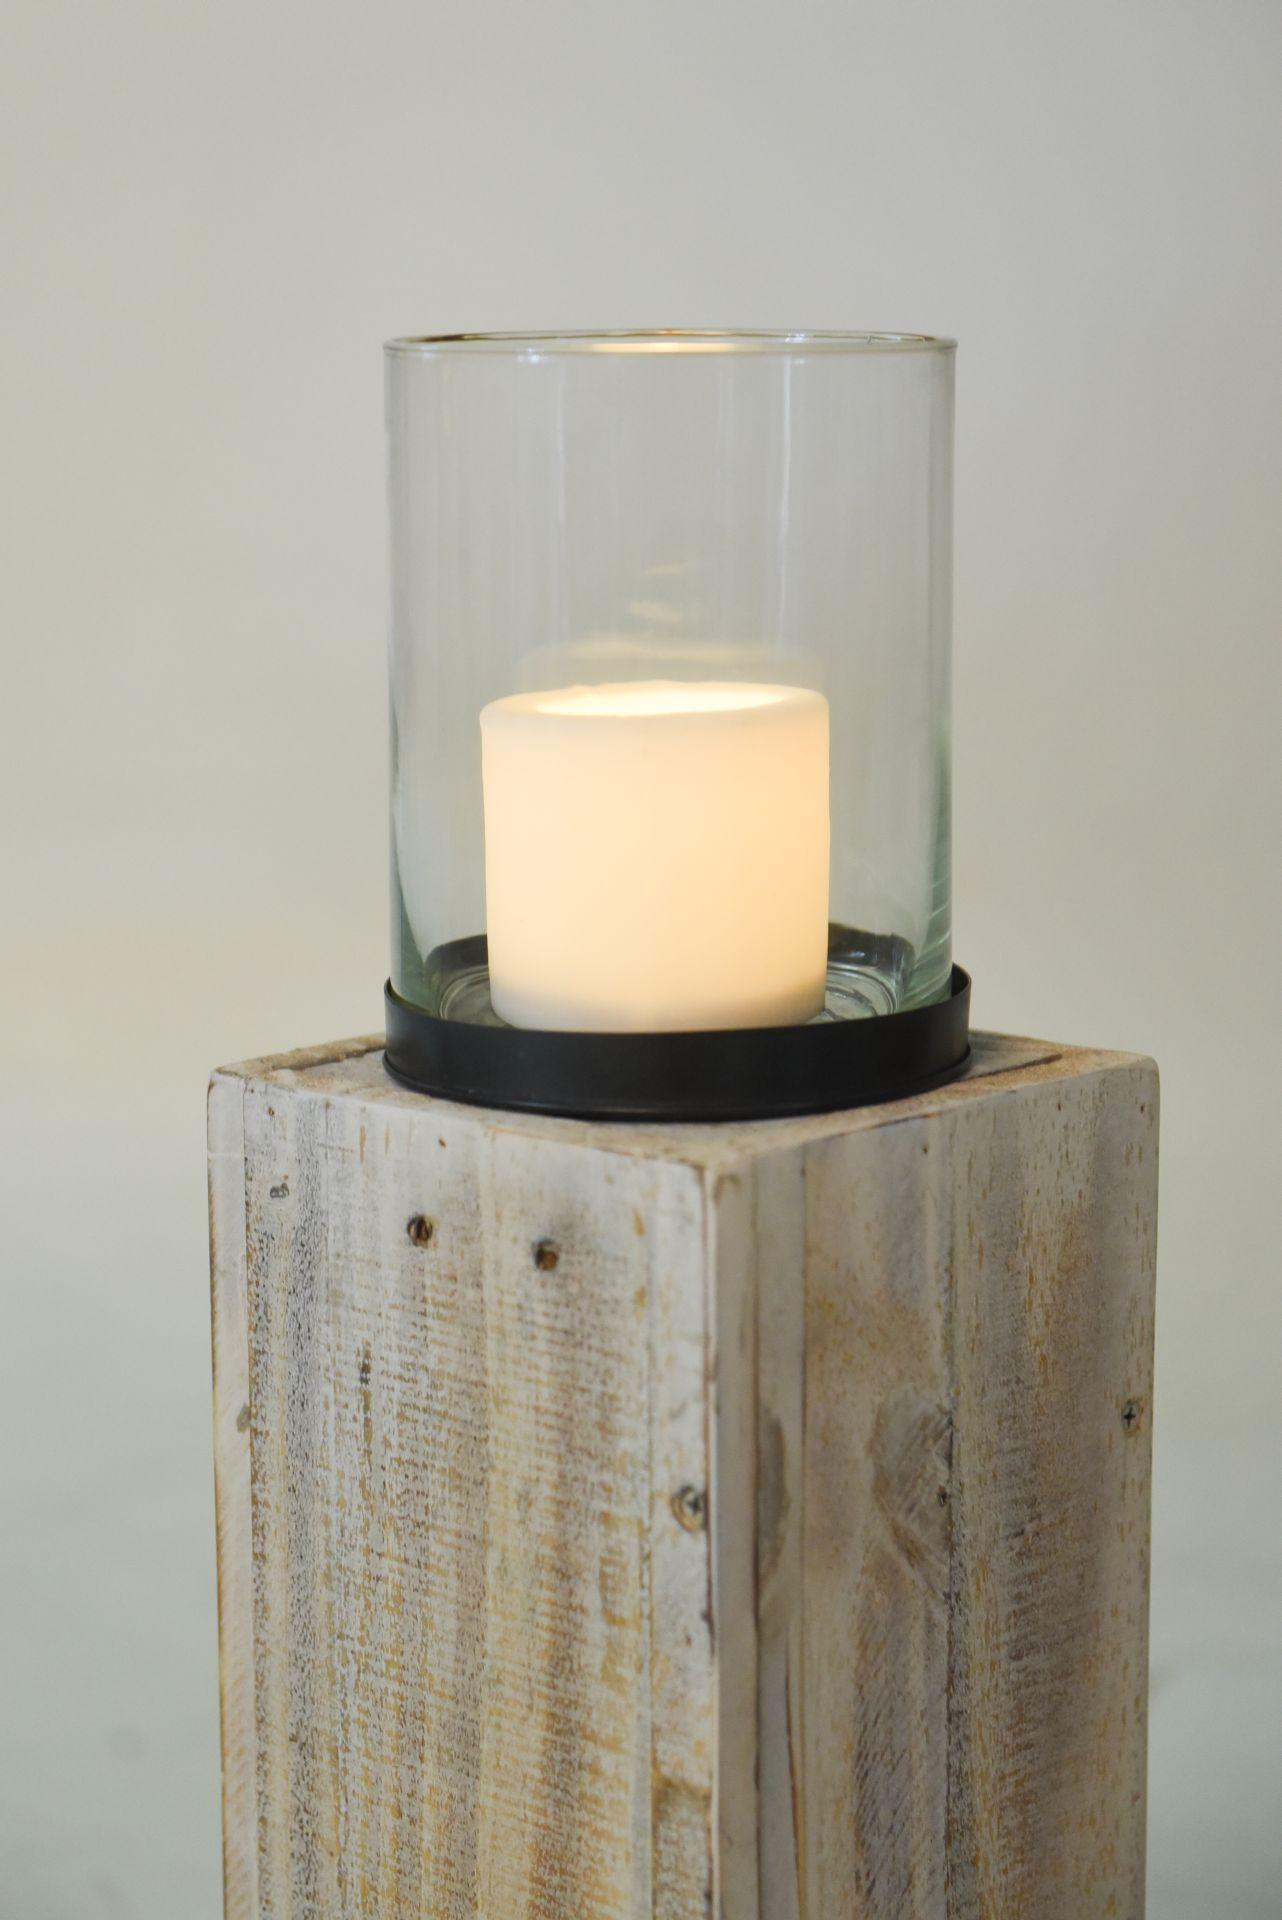 windlicht windlichts ule recycling holz lumira 60 cm. Black Bedroom Furniture Sets. Home Design Ideas